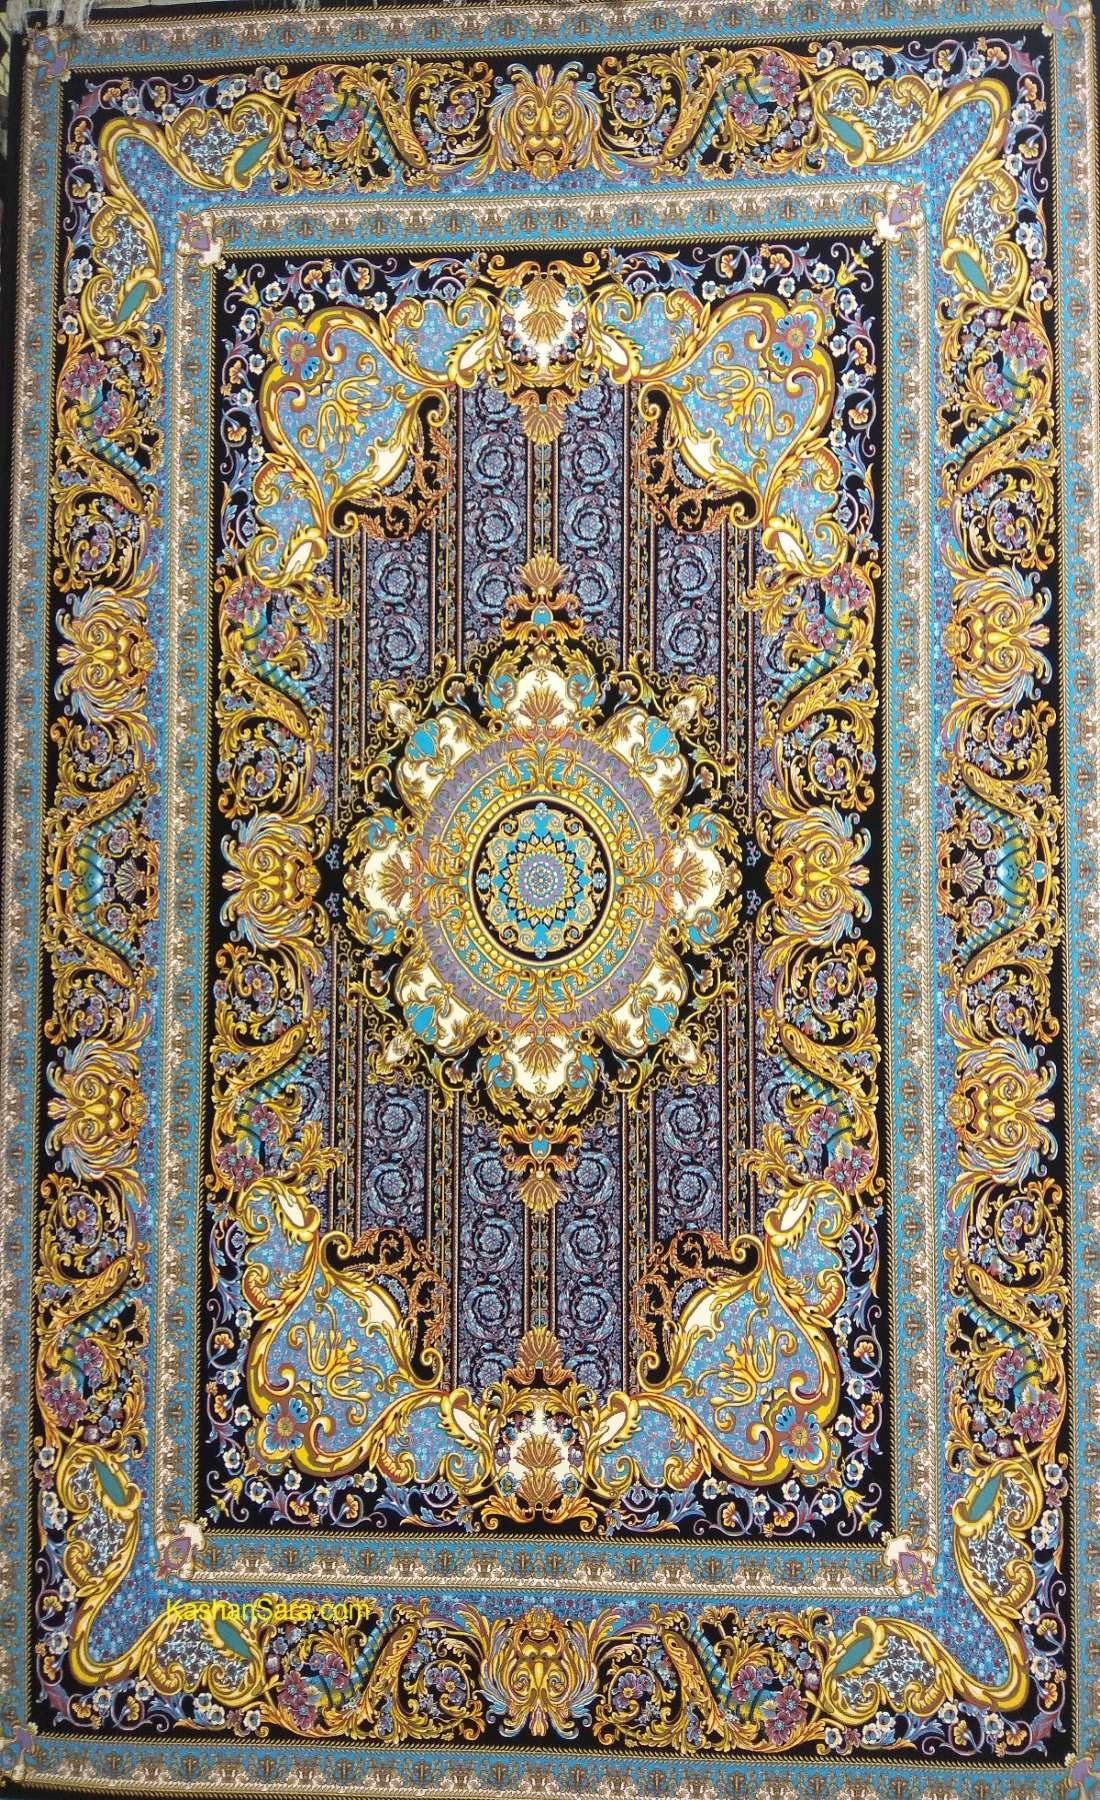 فرش کاشان ۱۲۰۰ شانه طرح فرانسوی (سلطان)